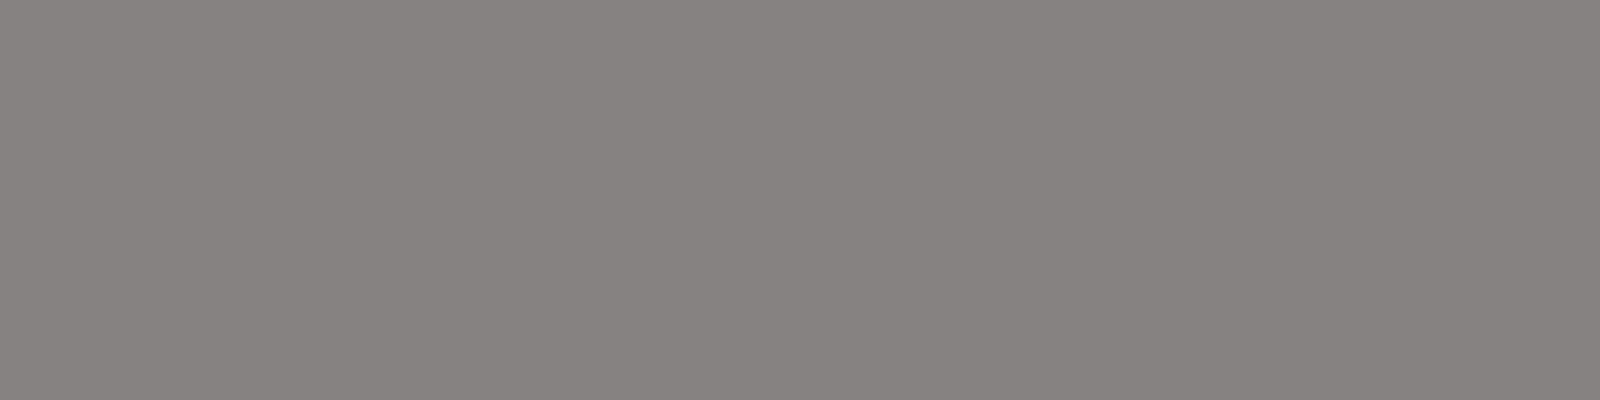 301 Dark Gray Gutter Color